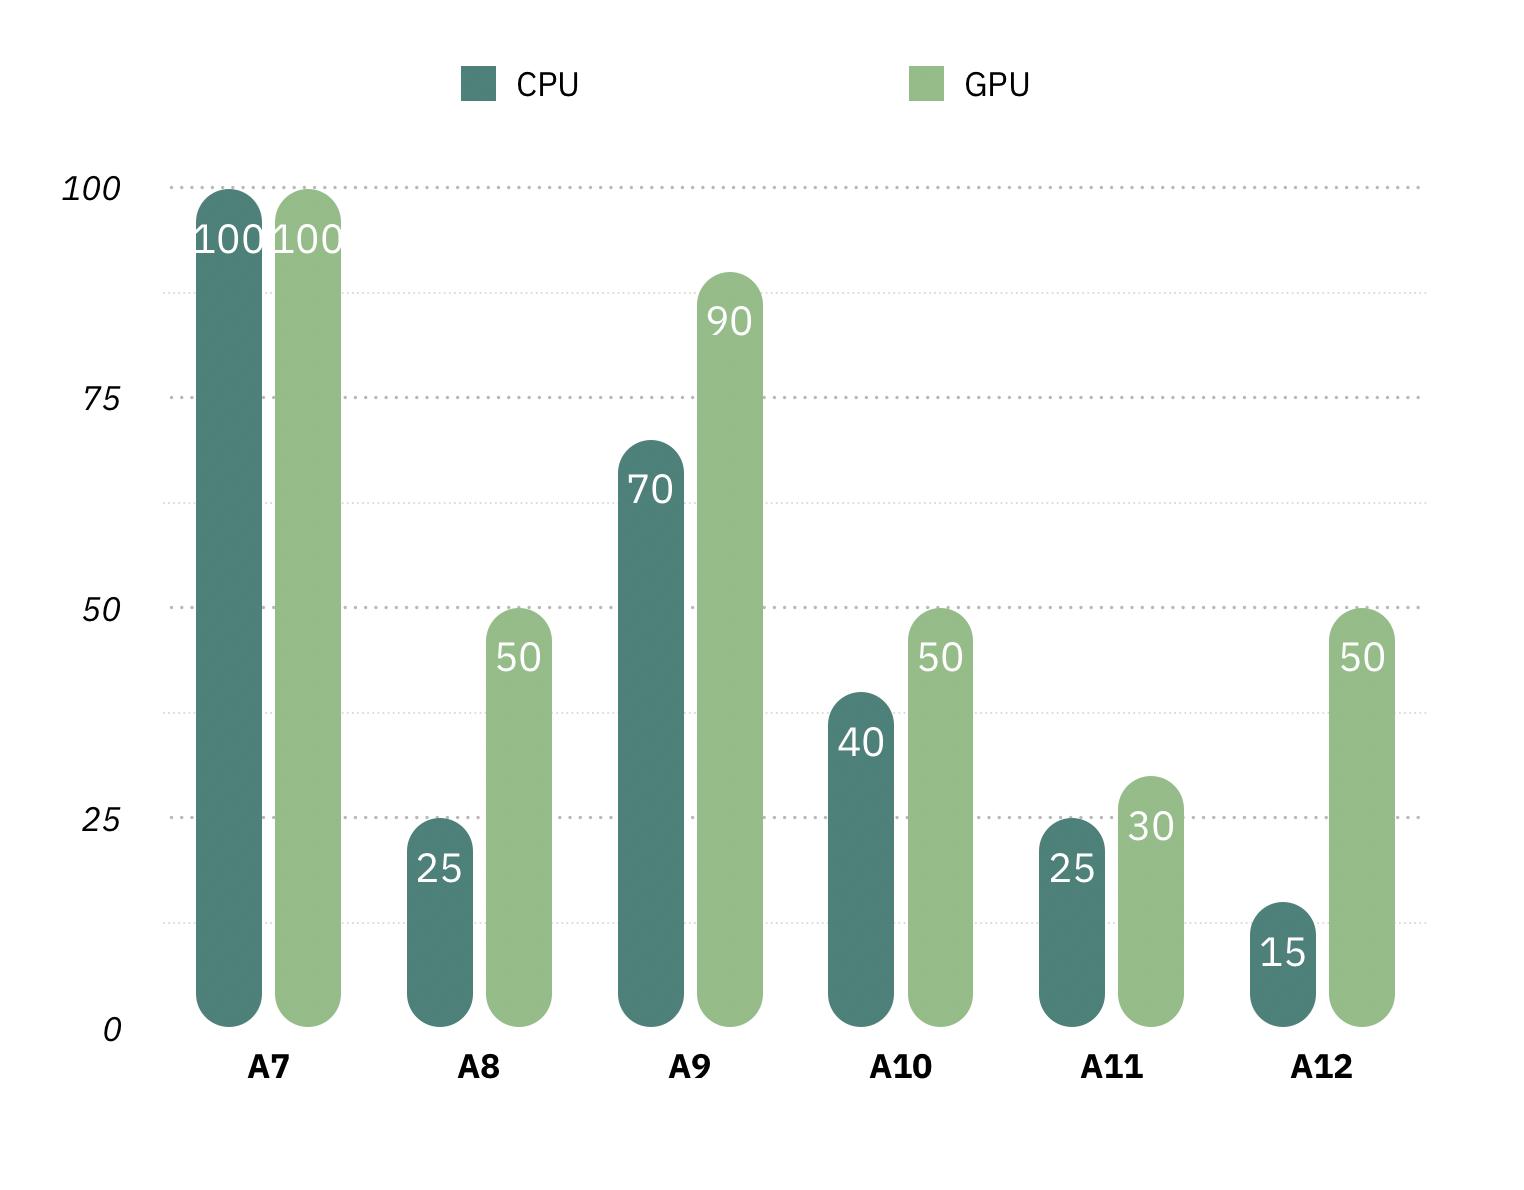 A 系列芯片相比前代性能增幅(数据来源:苹果新闻通稿;A11 和 A12 的 CPU 性能增幅指其中的高性能核心)